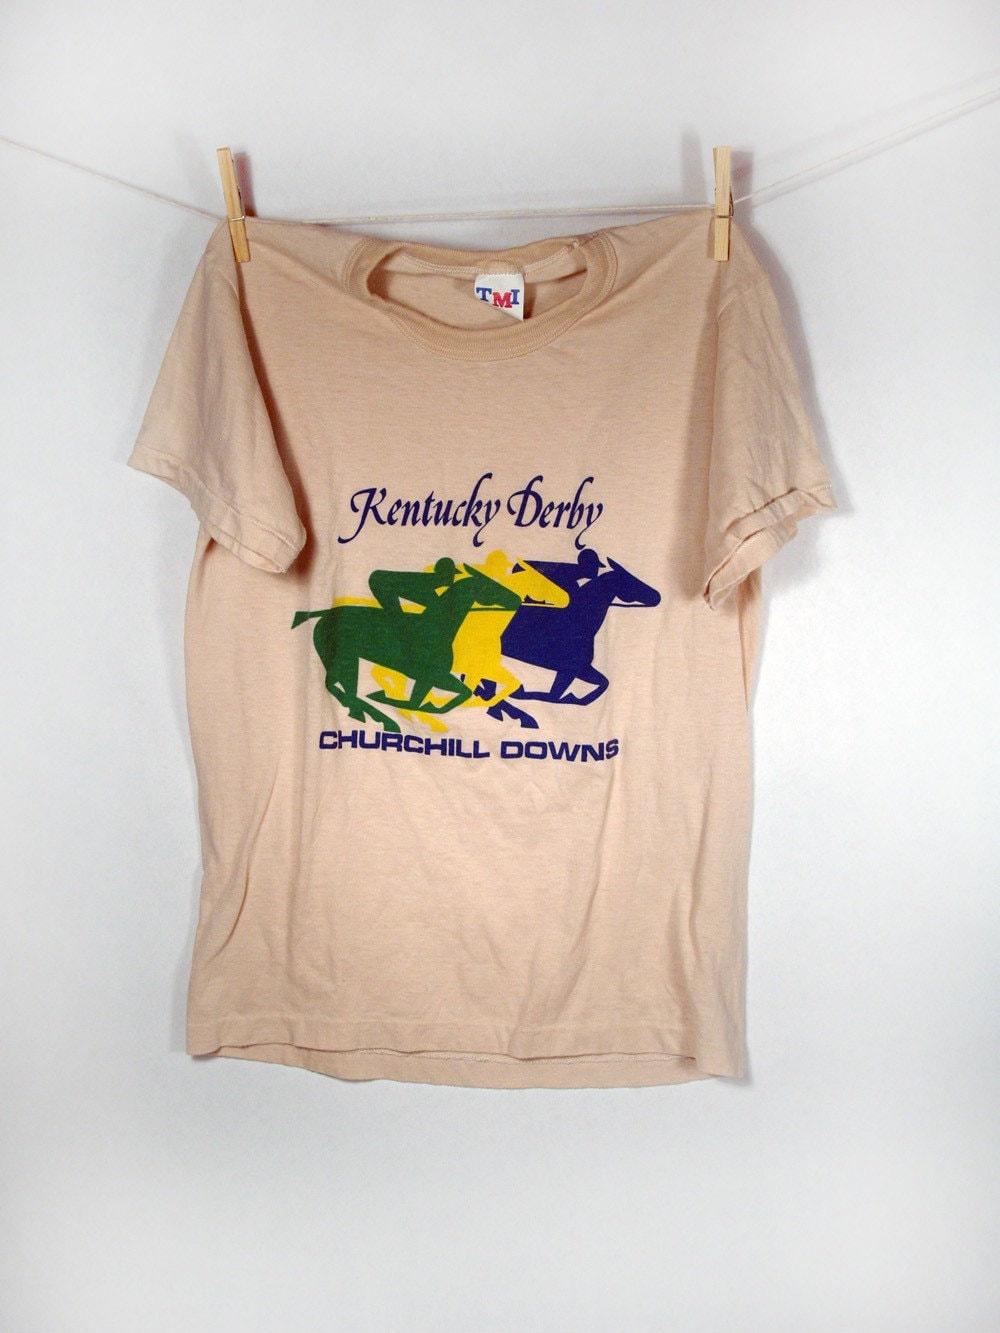 vintage kentucky derby t shirt